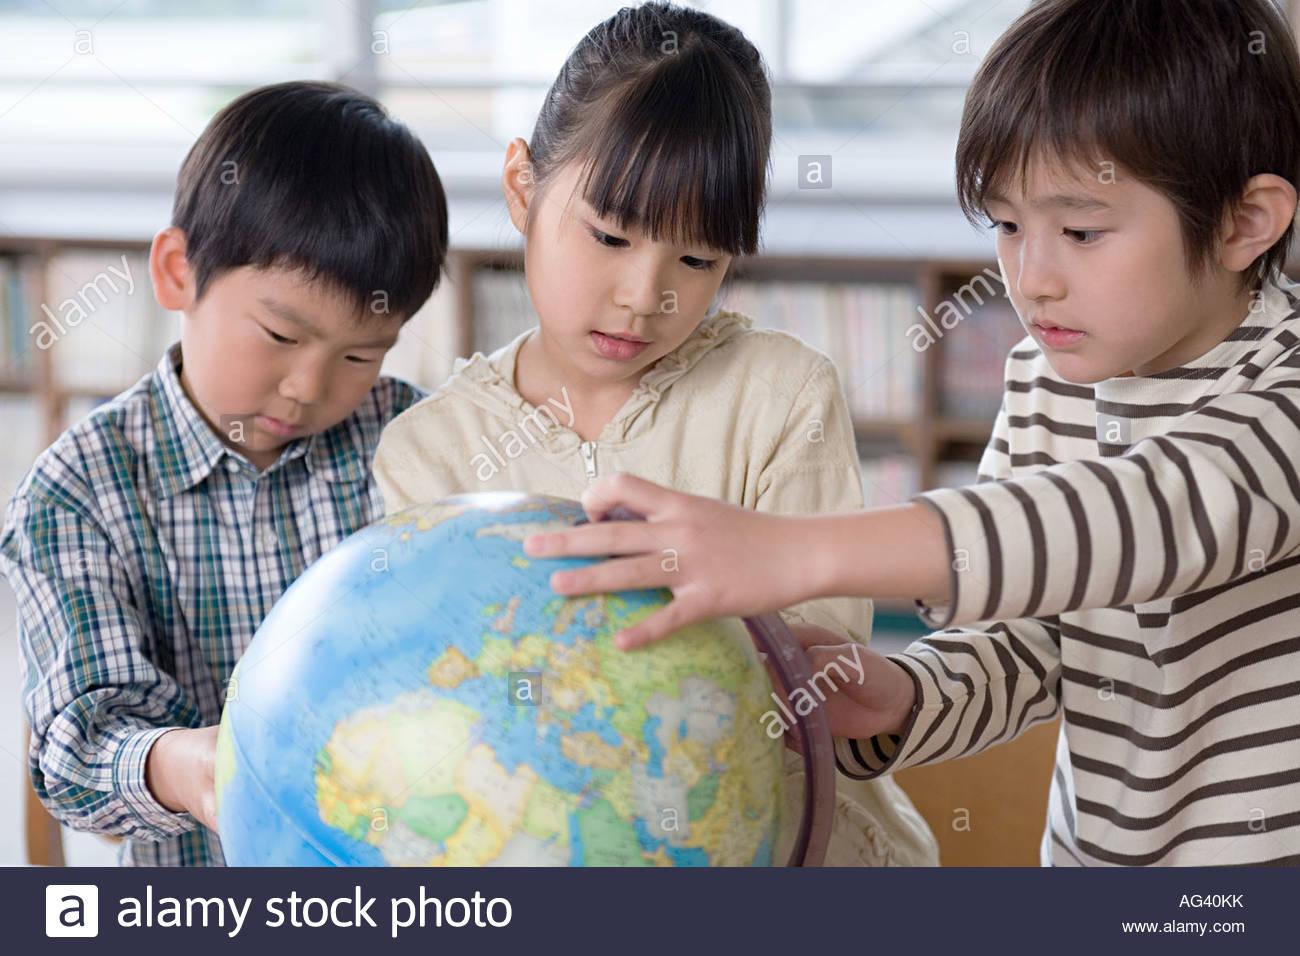 Kinder betrachten einen Globus Stockbild